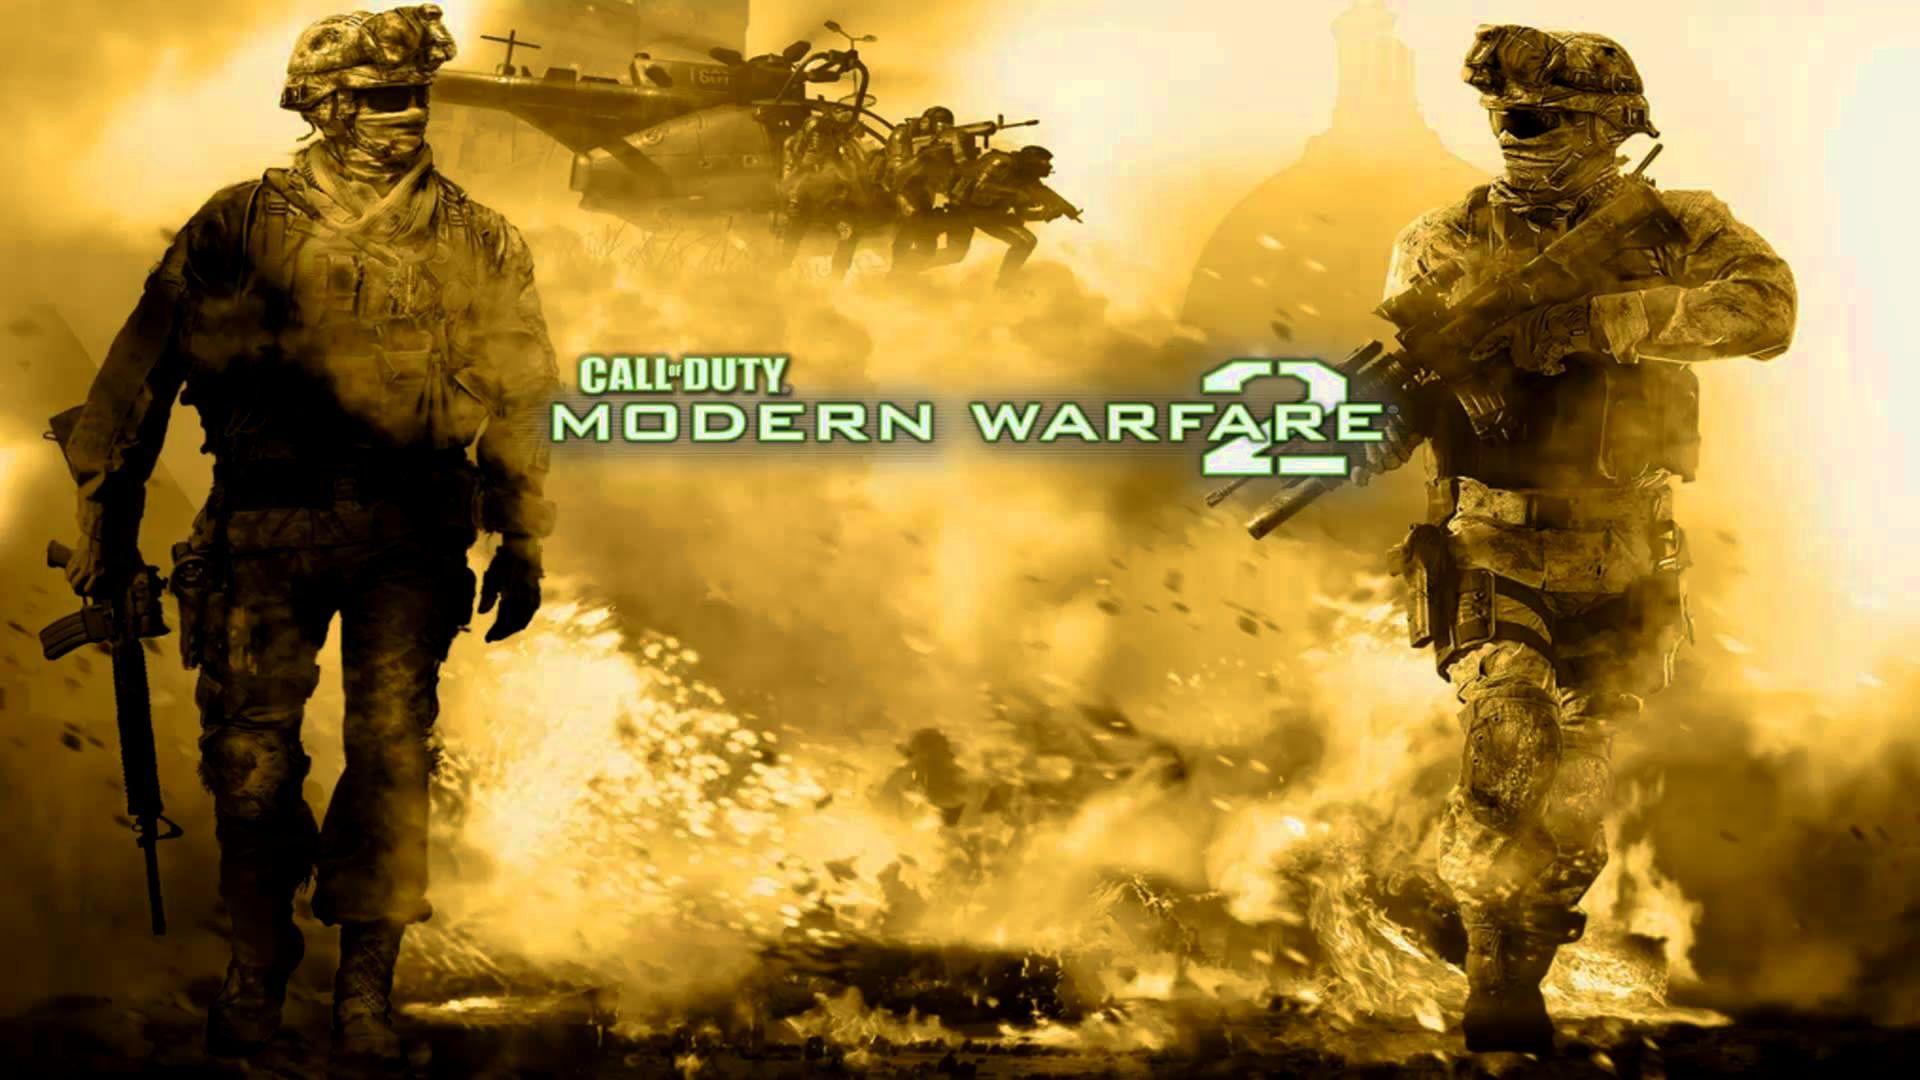 Call Of Duty Modern Warfare 2 Wallpaper Game Wallpaper